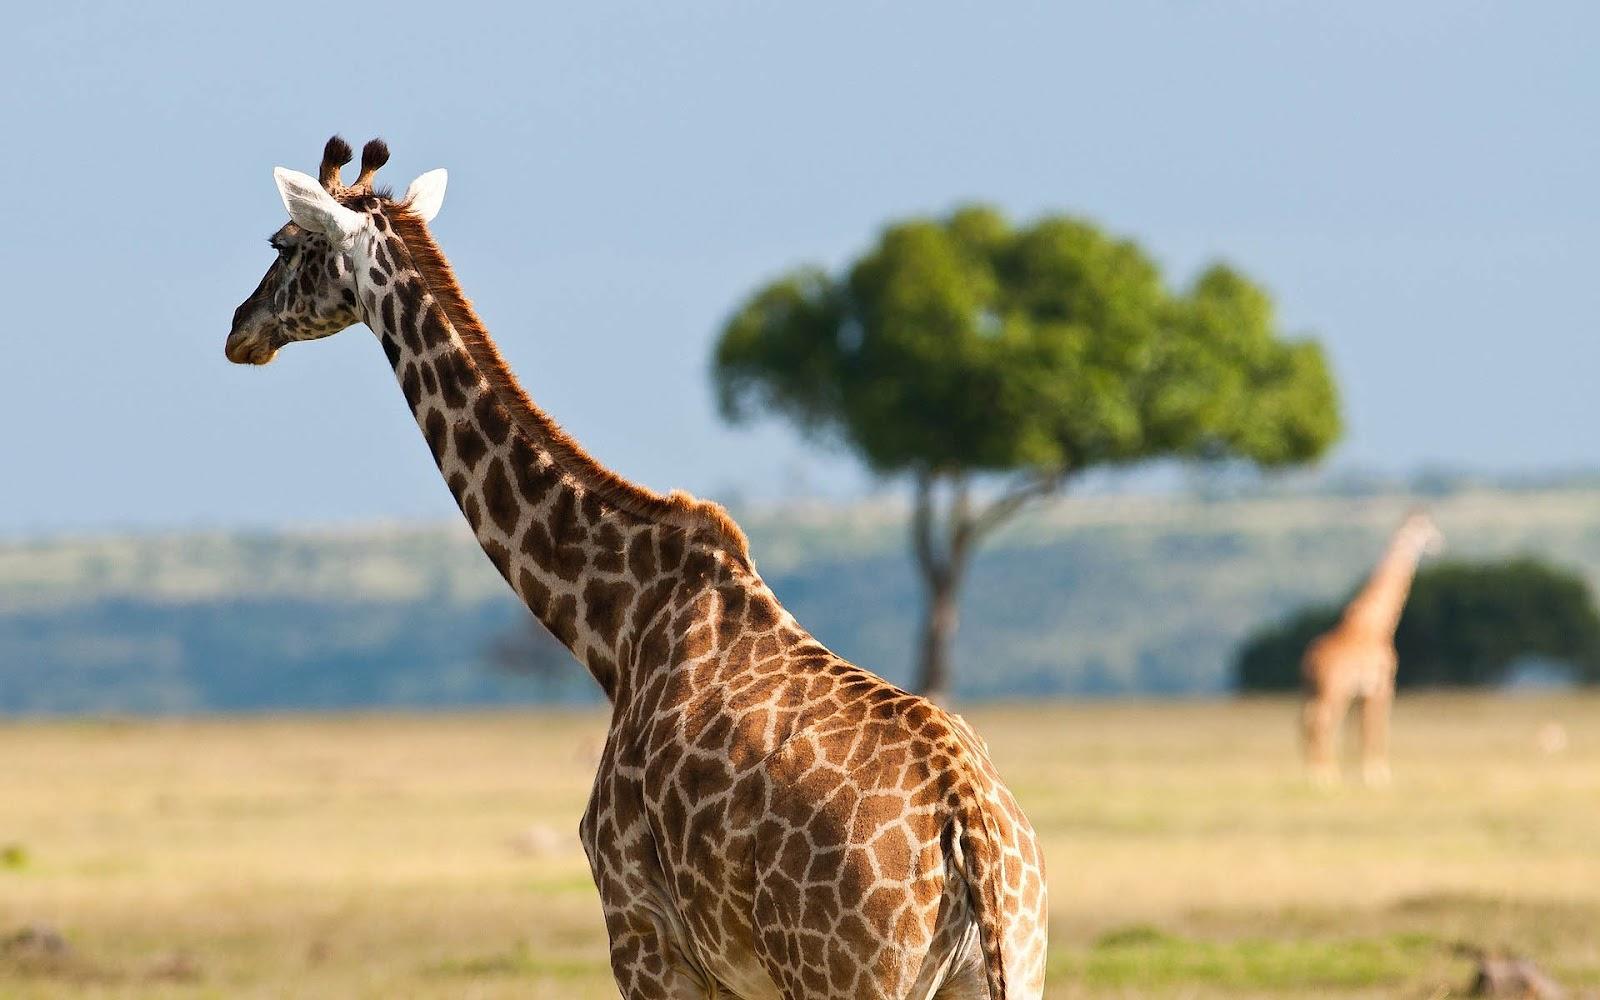 giraffe images 1080p